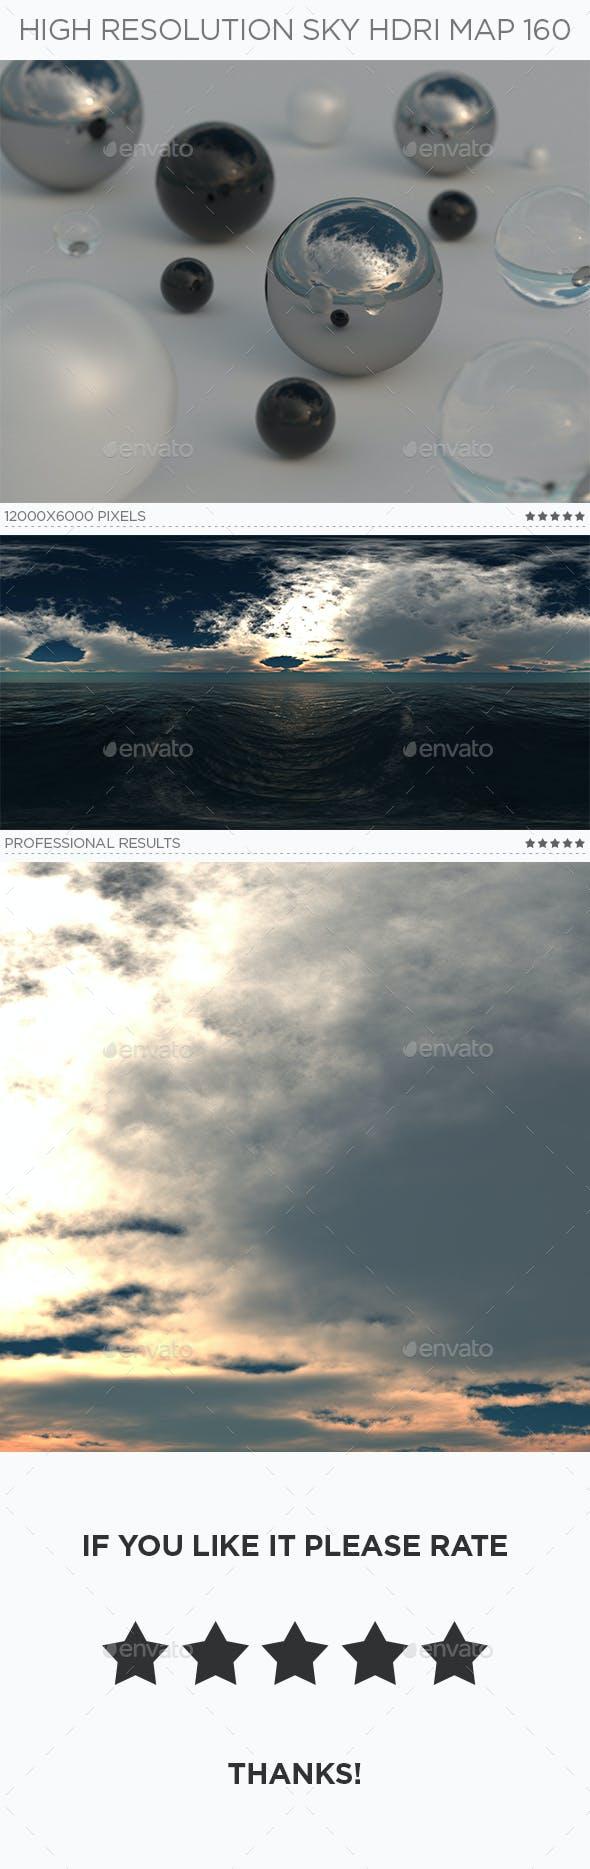 High Resolution Sky HDRi Map 160 - 3DOcean Item for Sale